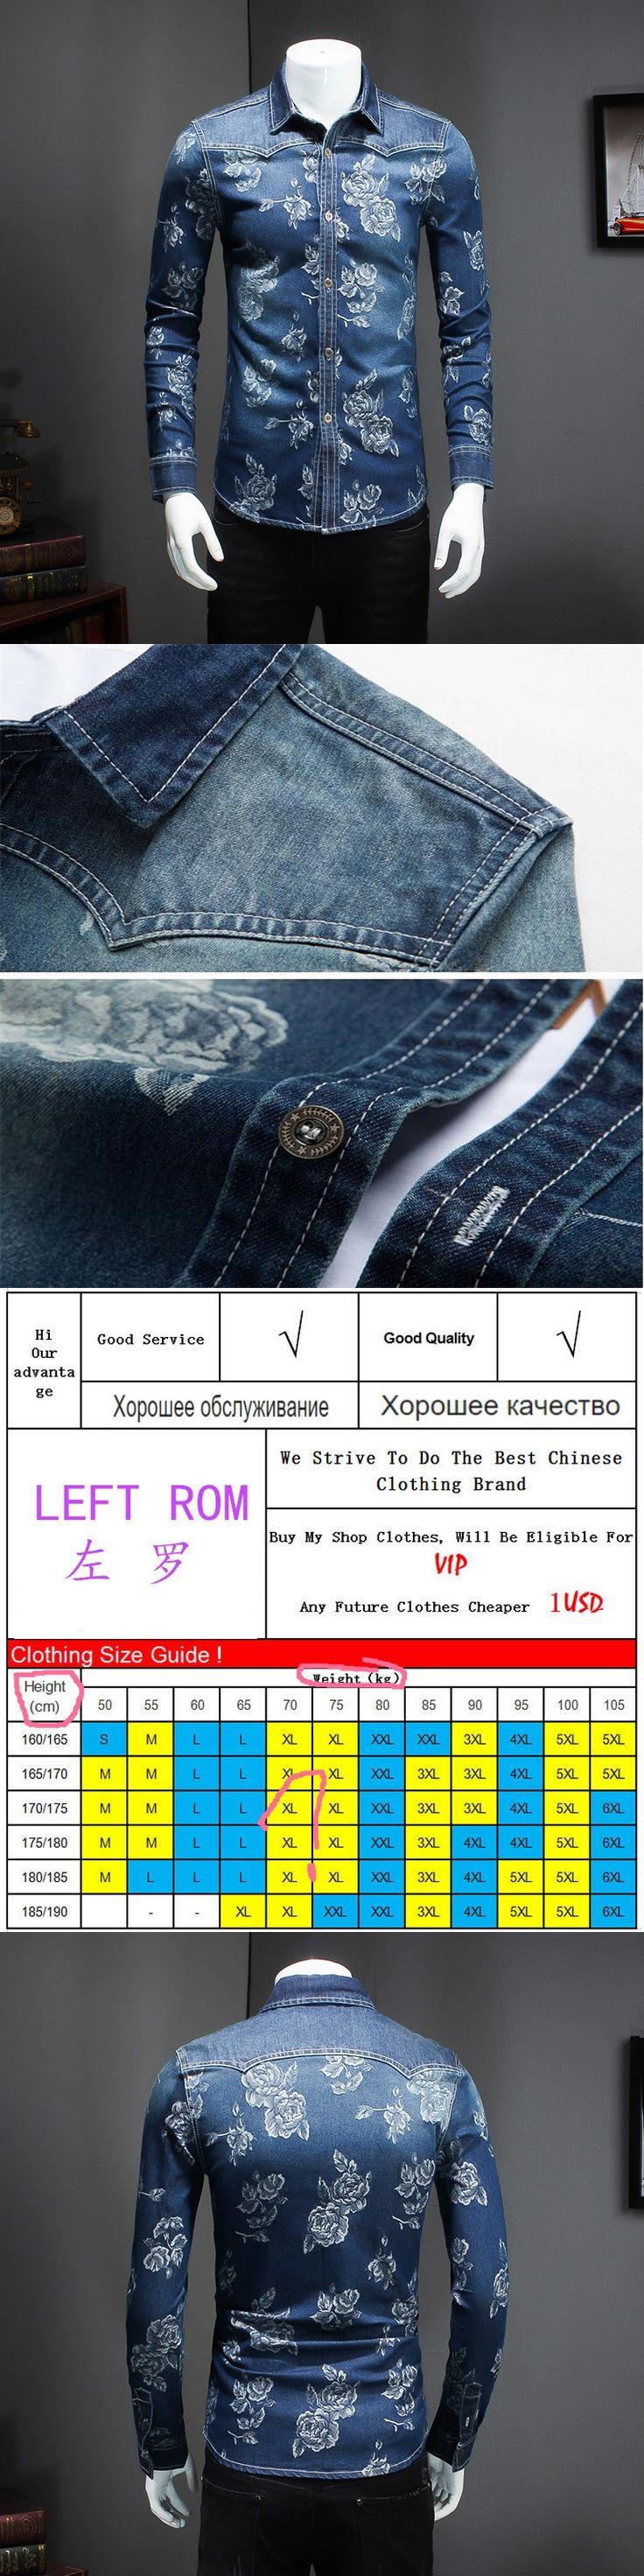 Shirt Jeans Long Sleeve Men 2017 New Male Cotton Jeans Shirt Boy Best Popular Selling Shirt Large Size S-5XL Left Rom Hot Sale